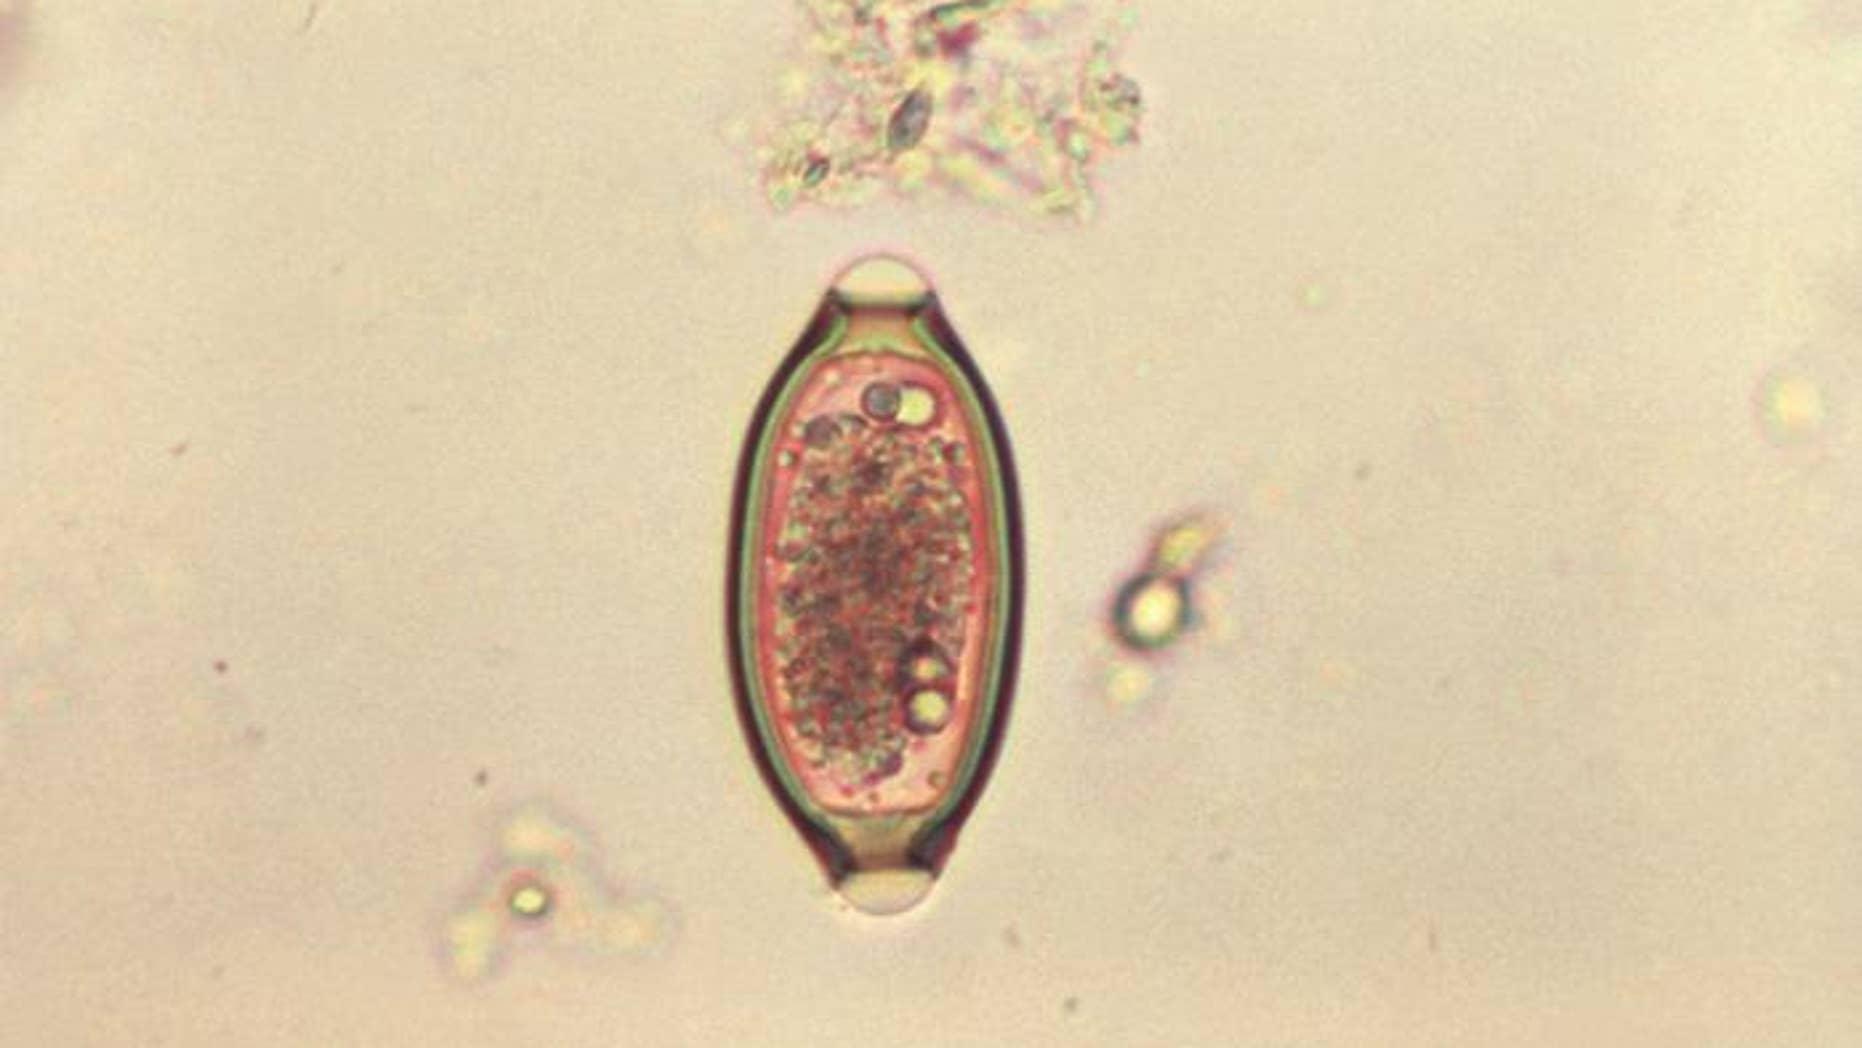 papiloma palpebral perros hpv impfung im erwachsenenalter